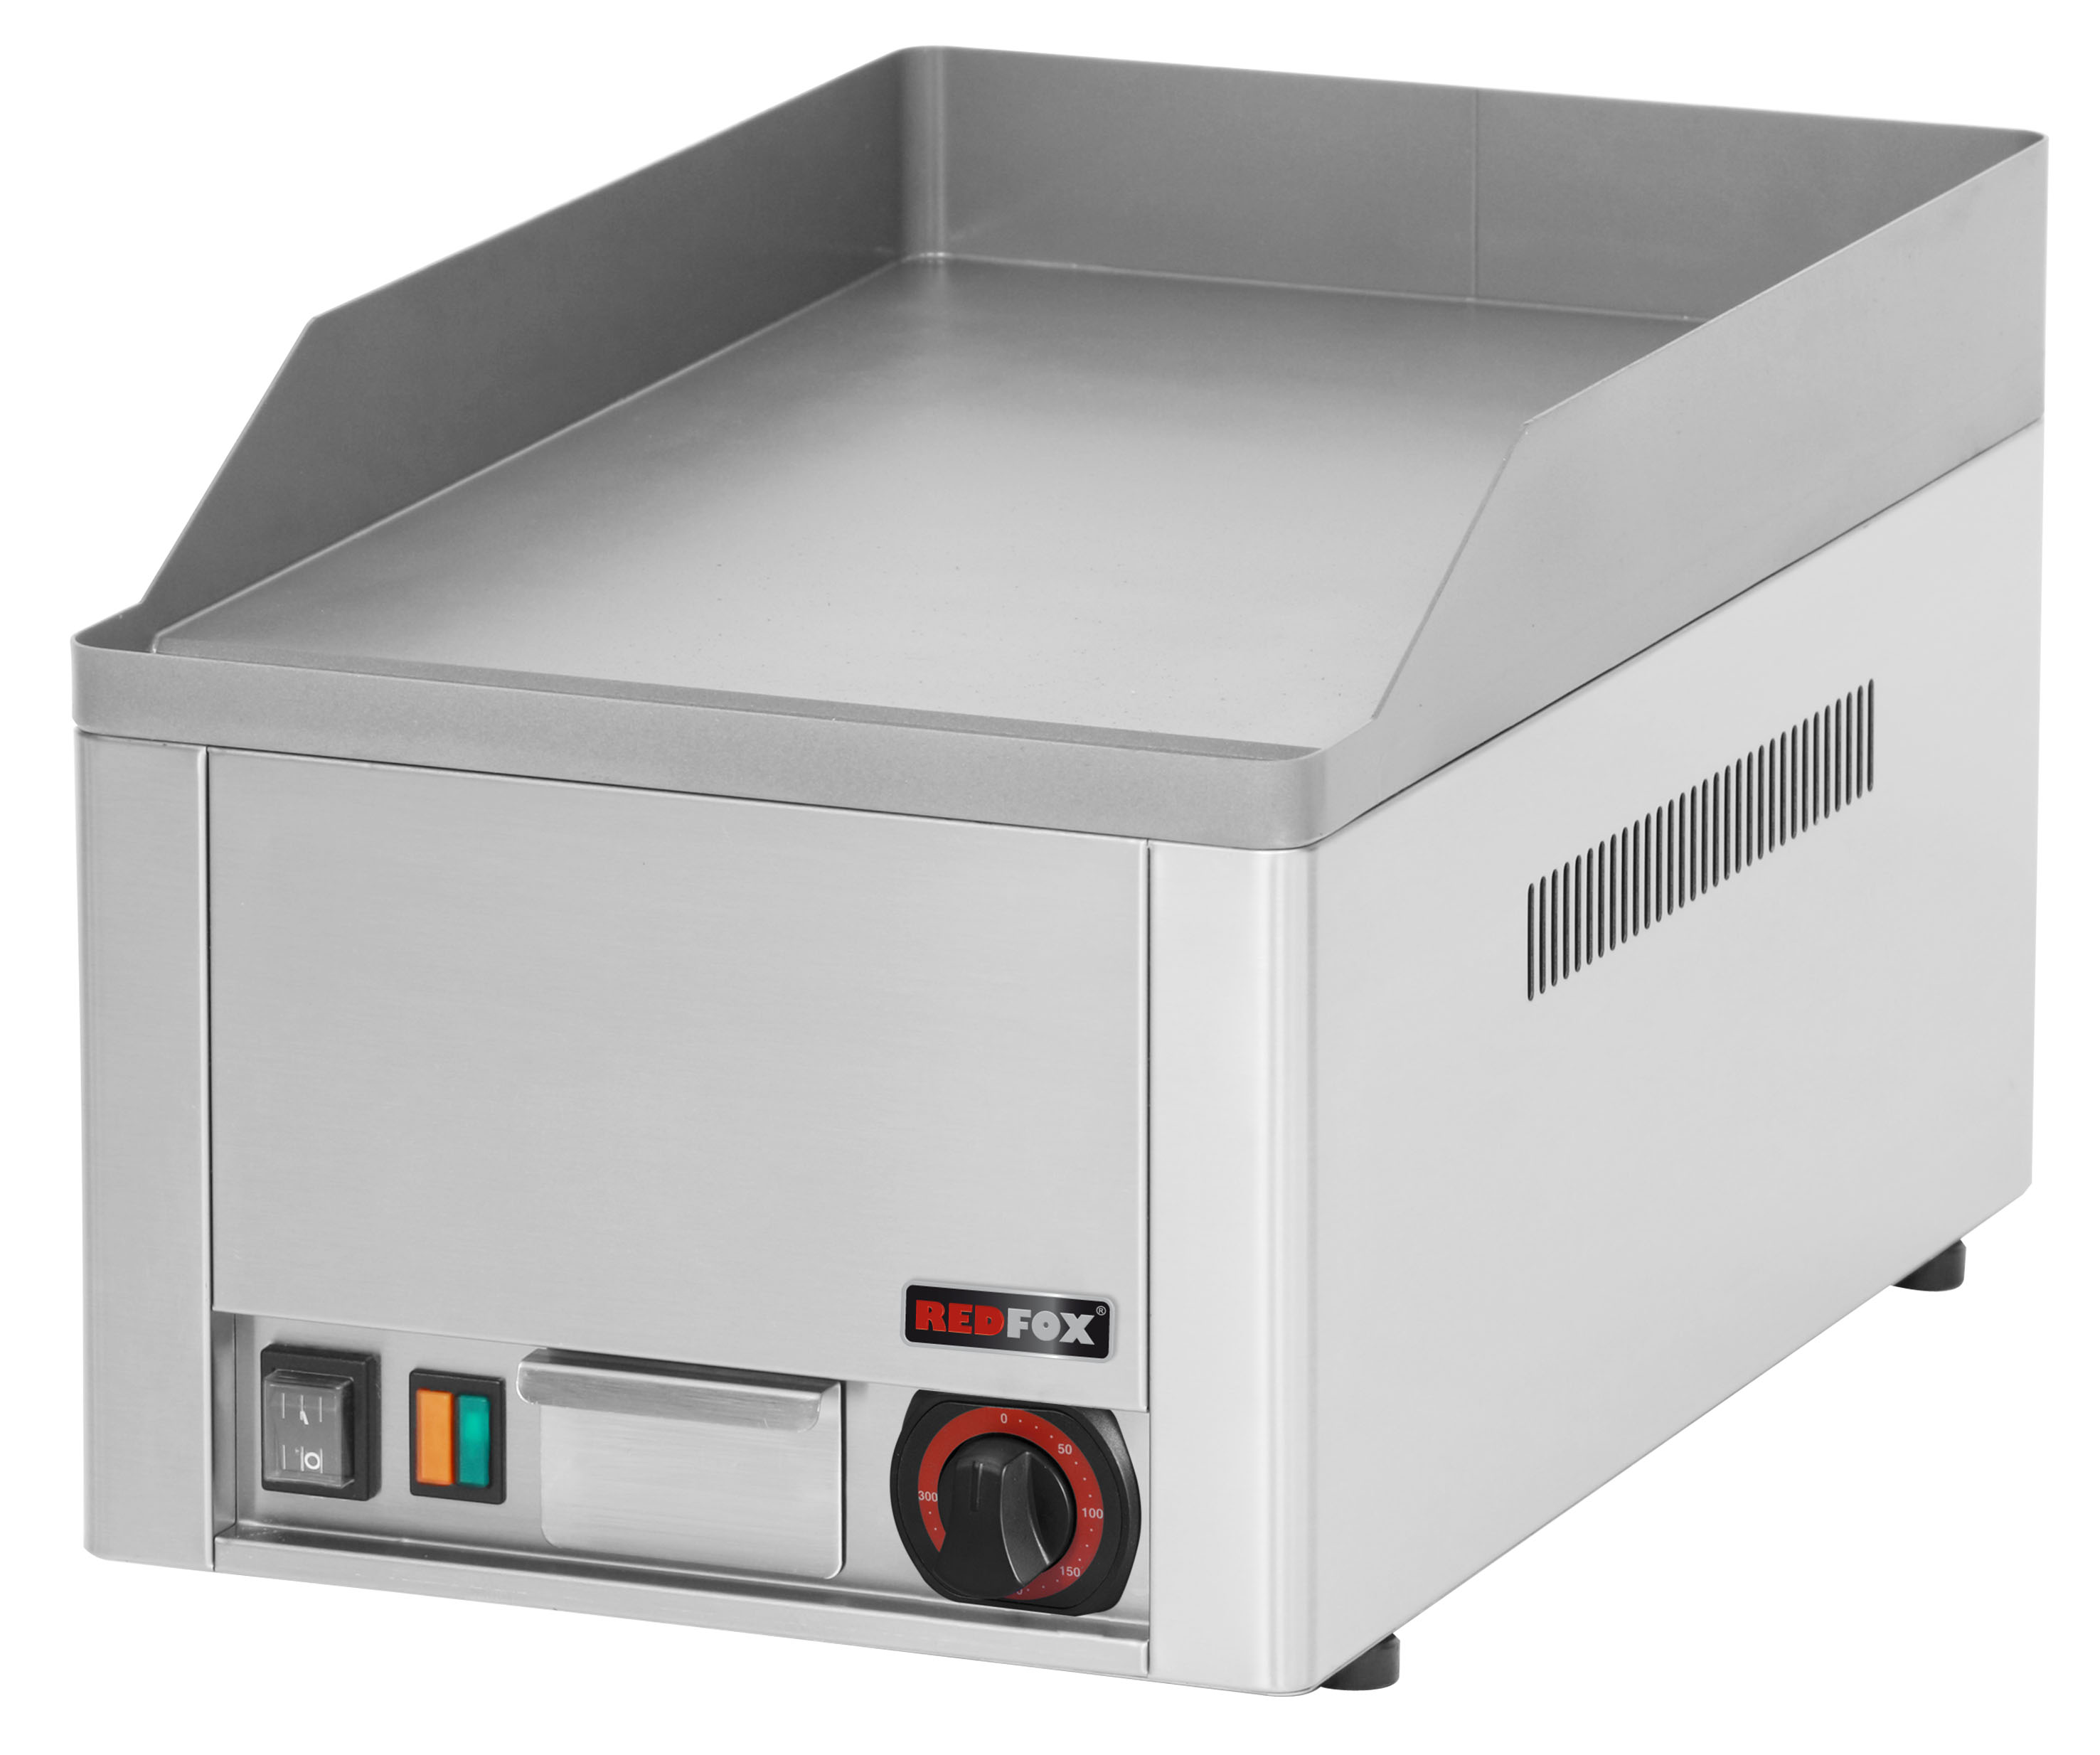 Deska grilovací elektrická FTH 30 E hladká ocelová REDFOX